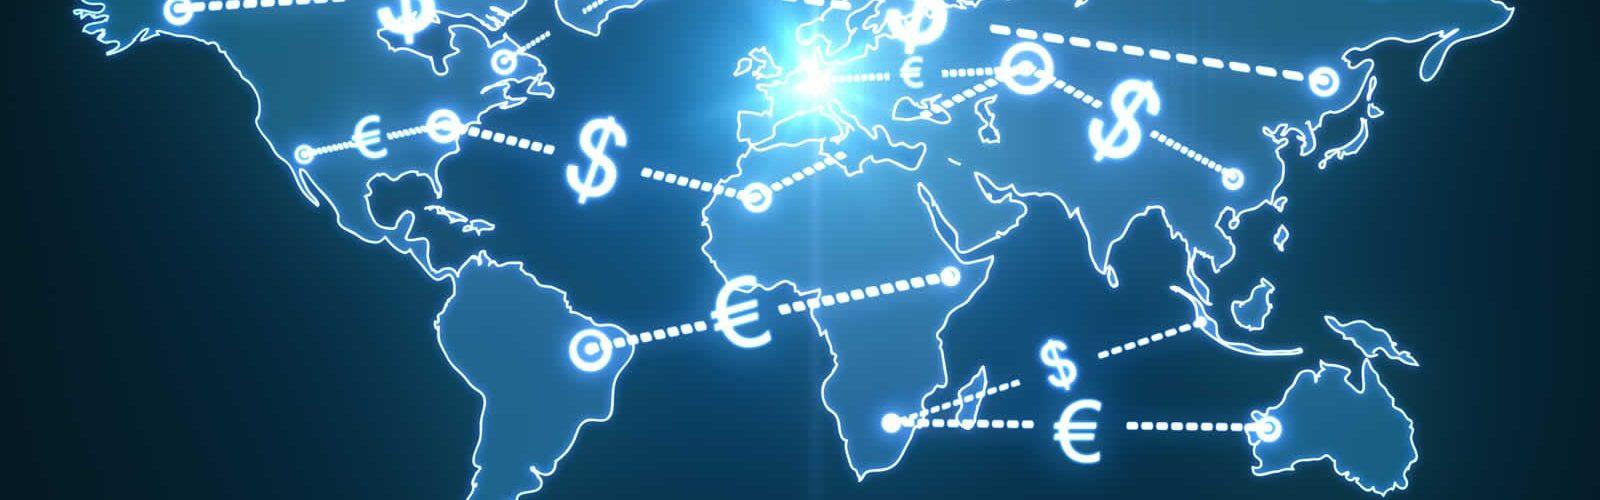 12-services-transfert-argent-change-los-angeles